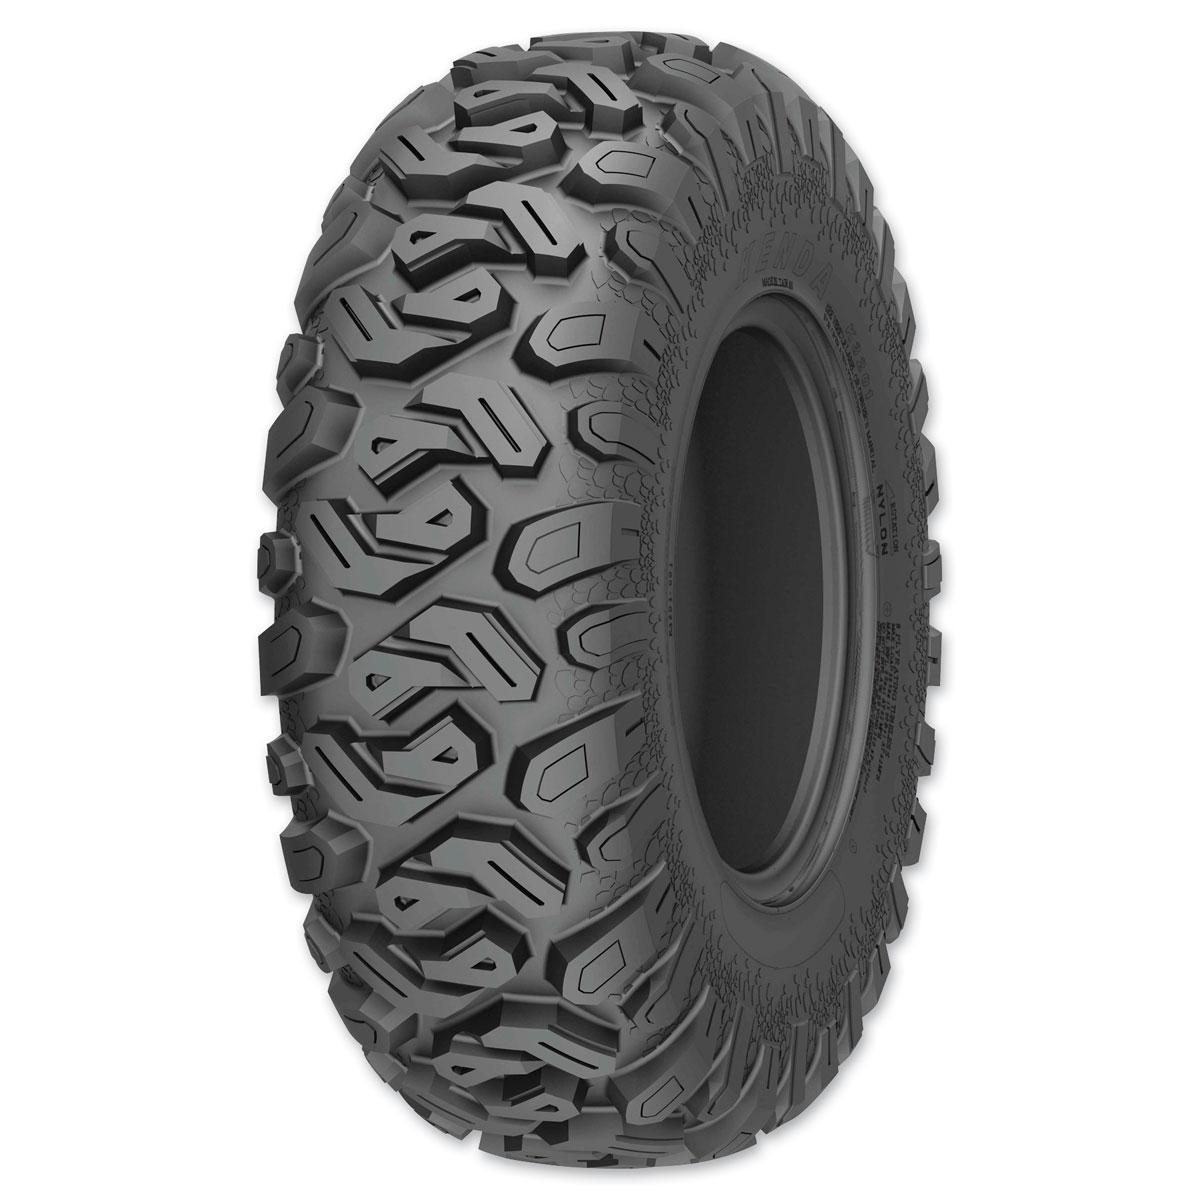 Kenda Tires Mastodon 25X8R-12 Front/Rear Tire